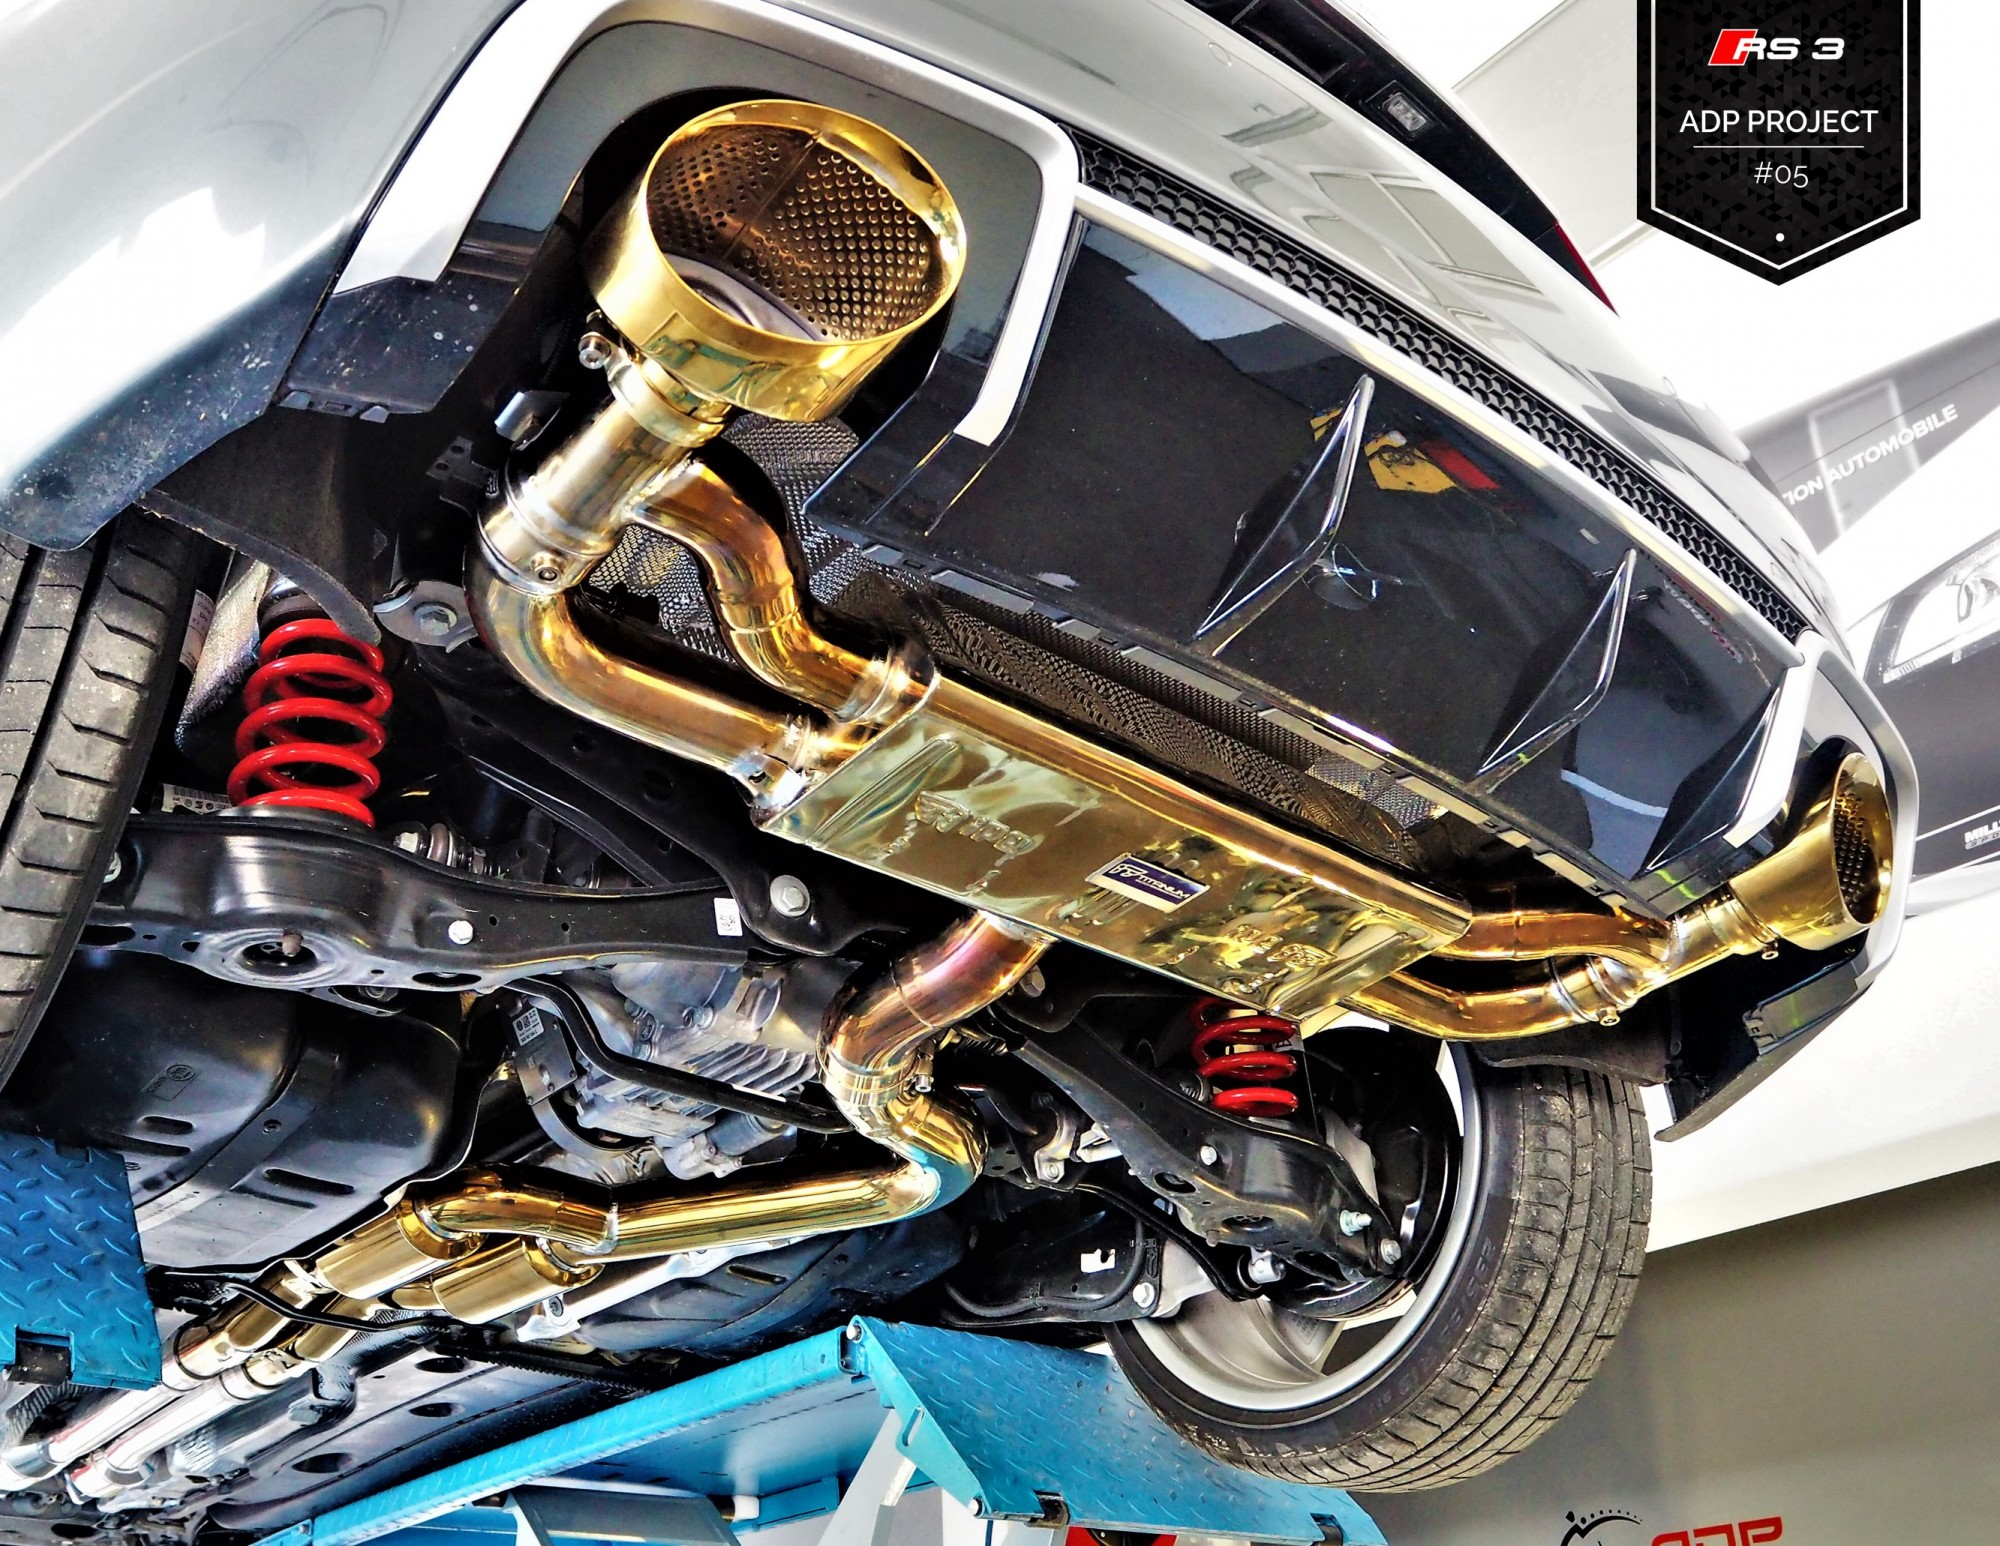 Echappement iPE Innotech Titane Salon de Provence - Audi RS3 8V ADP Performance